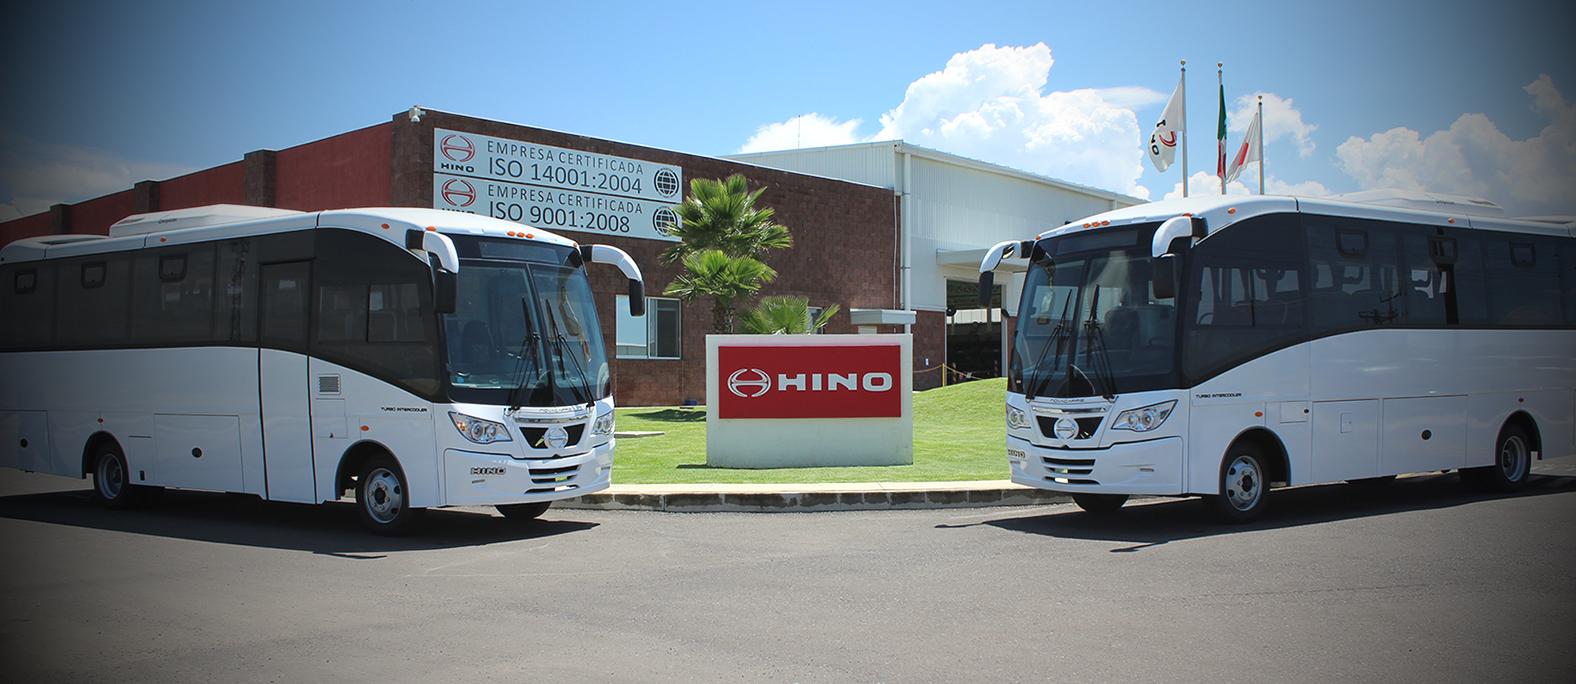 Autobús Turismo